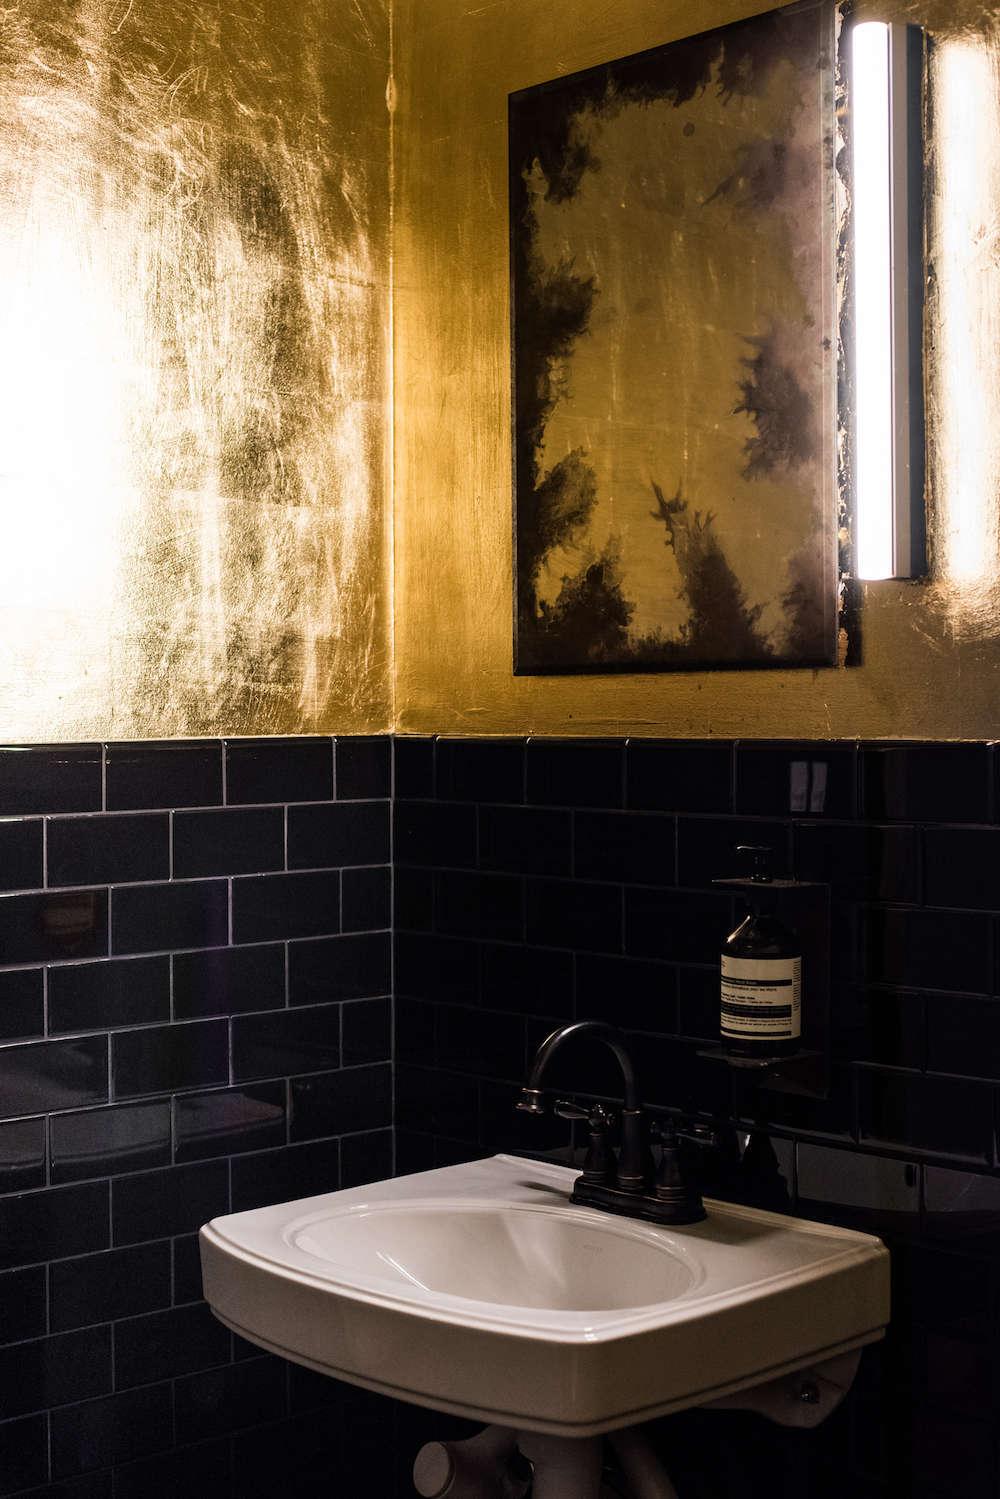 Bathroom Fixtures San Francisco restaurant visit: a nightbird in flight, in san francisco